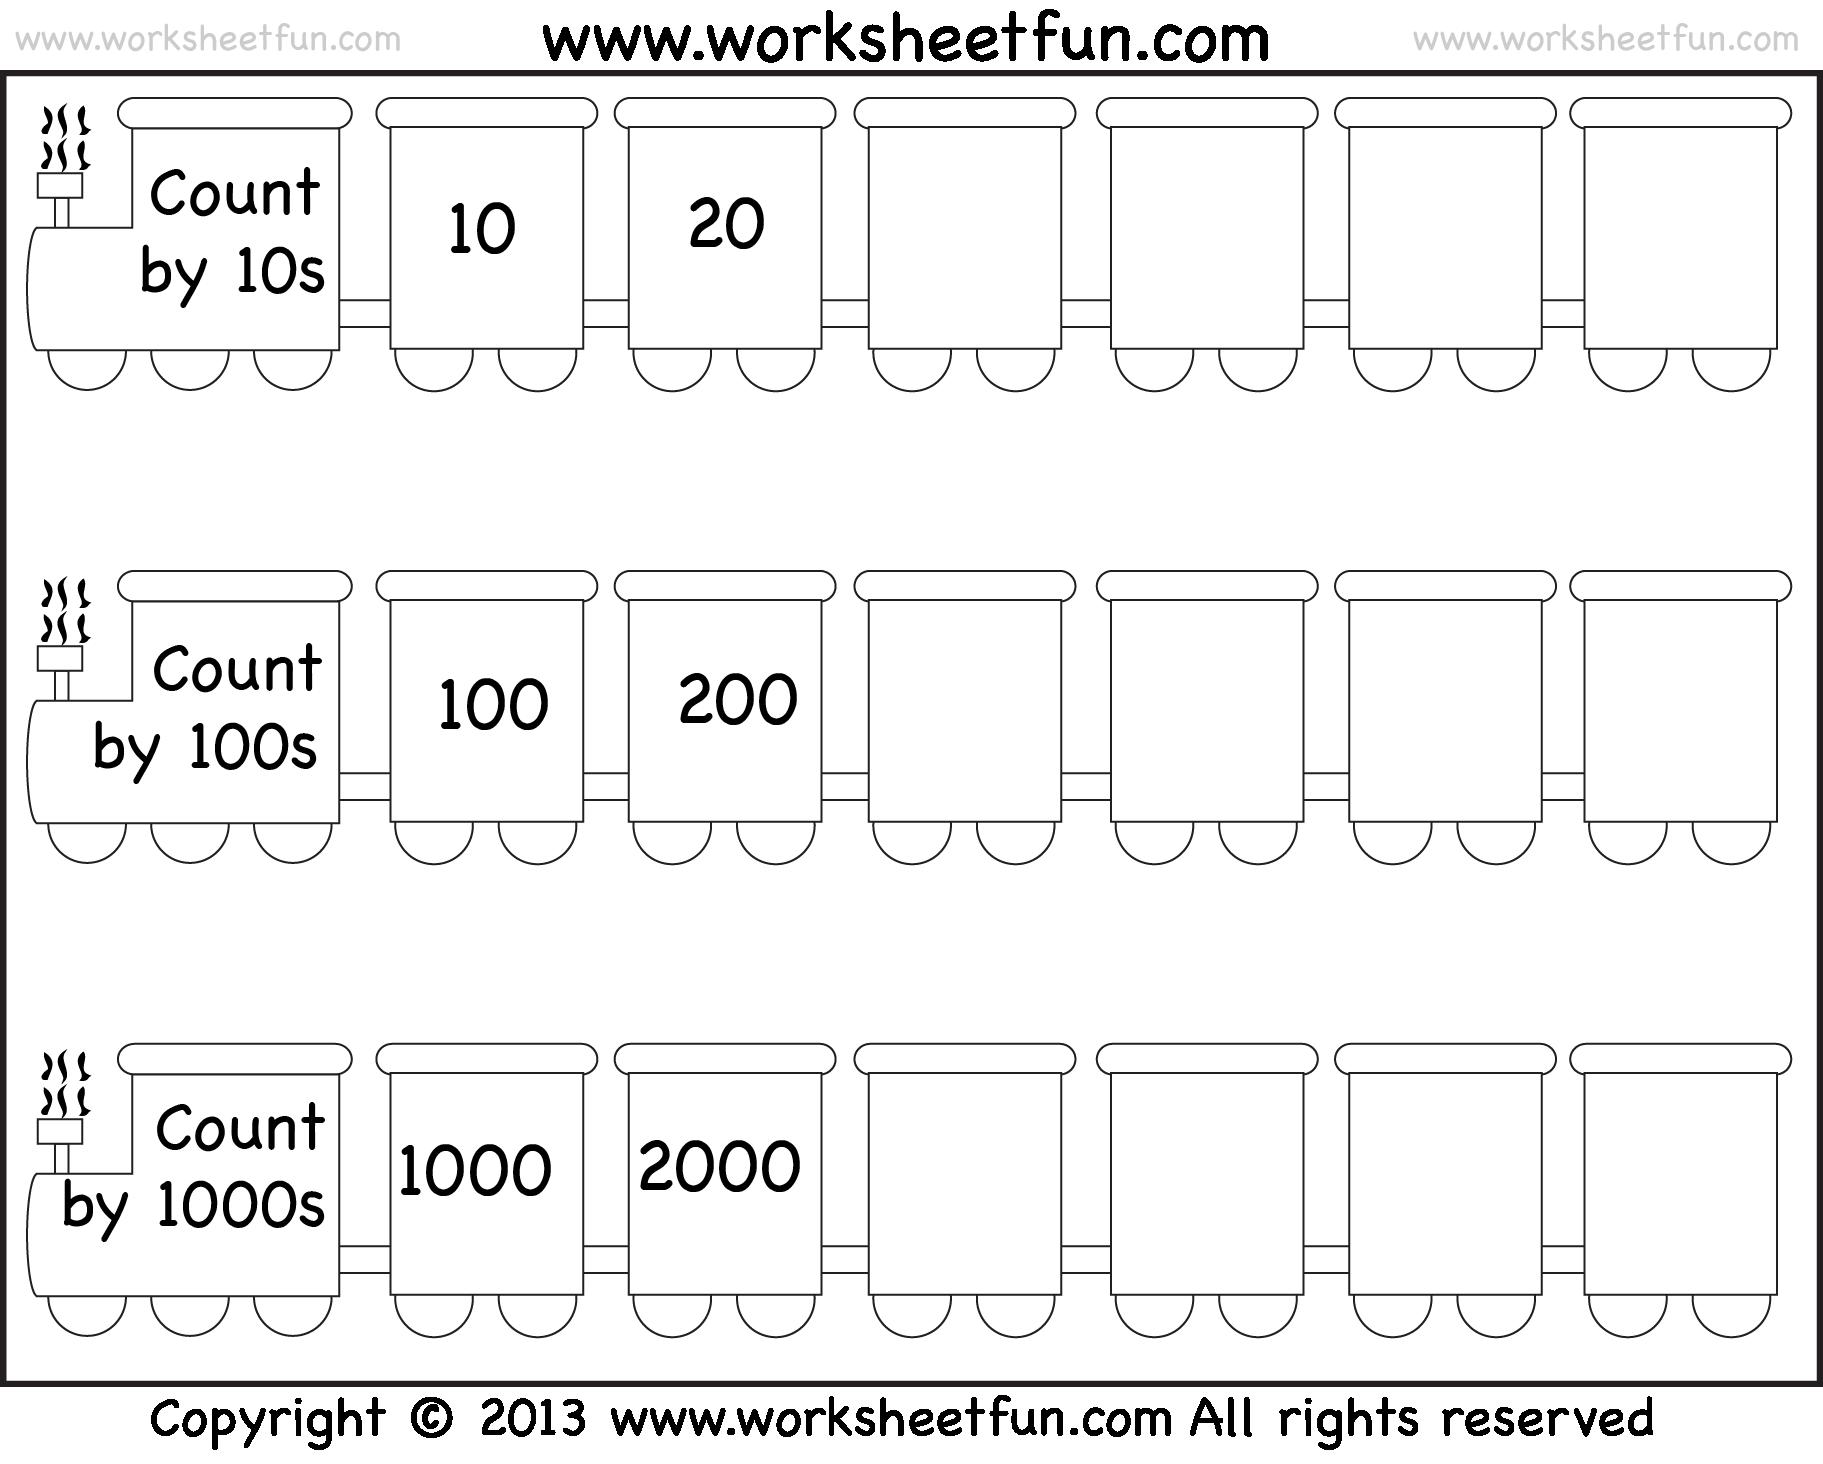 Worksheet 510660 Kindergarten Counting to 100 Worksheets – Counting by Tens Worksheets Kindergarten